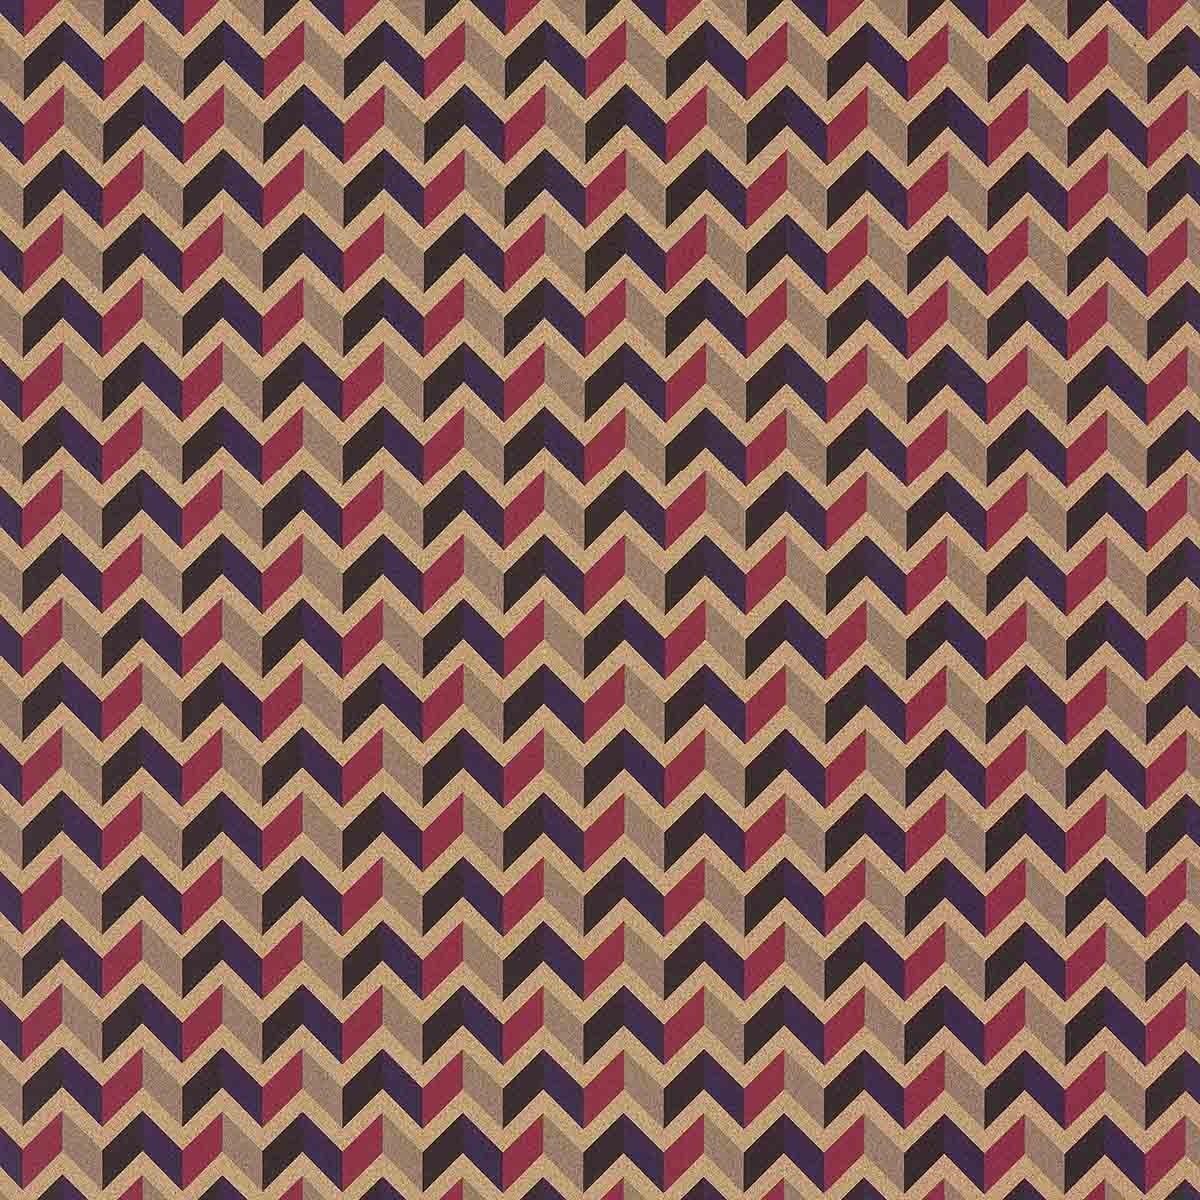 Decorative cork thin paper Iridescence 06.04